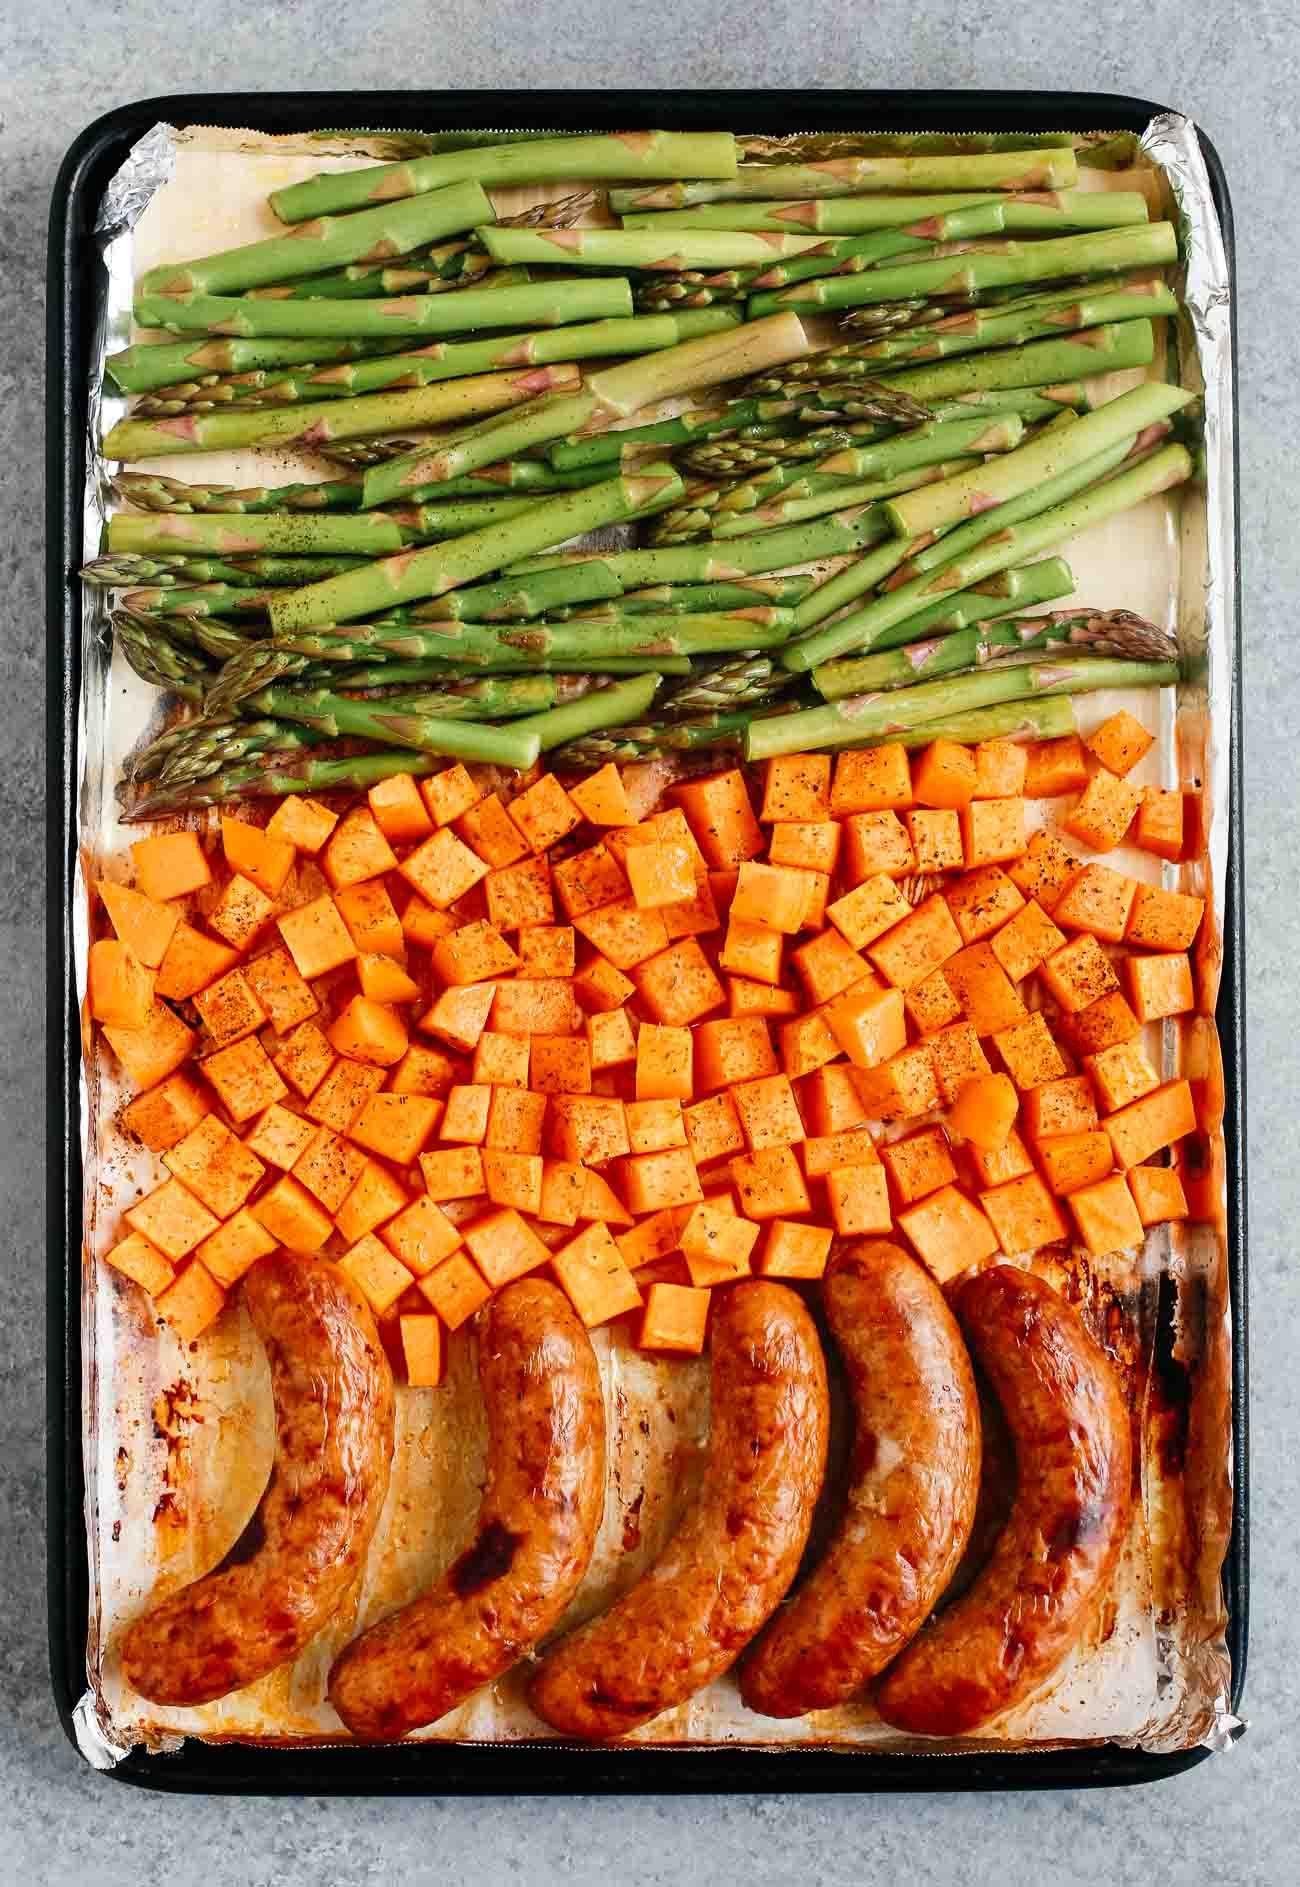 A sheet pan with sausage, potatoes, and asparagus.